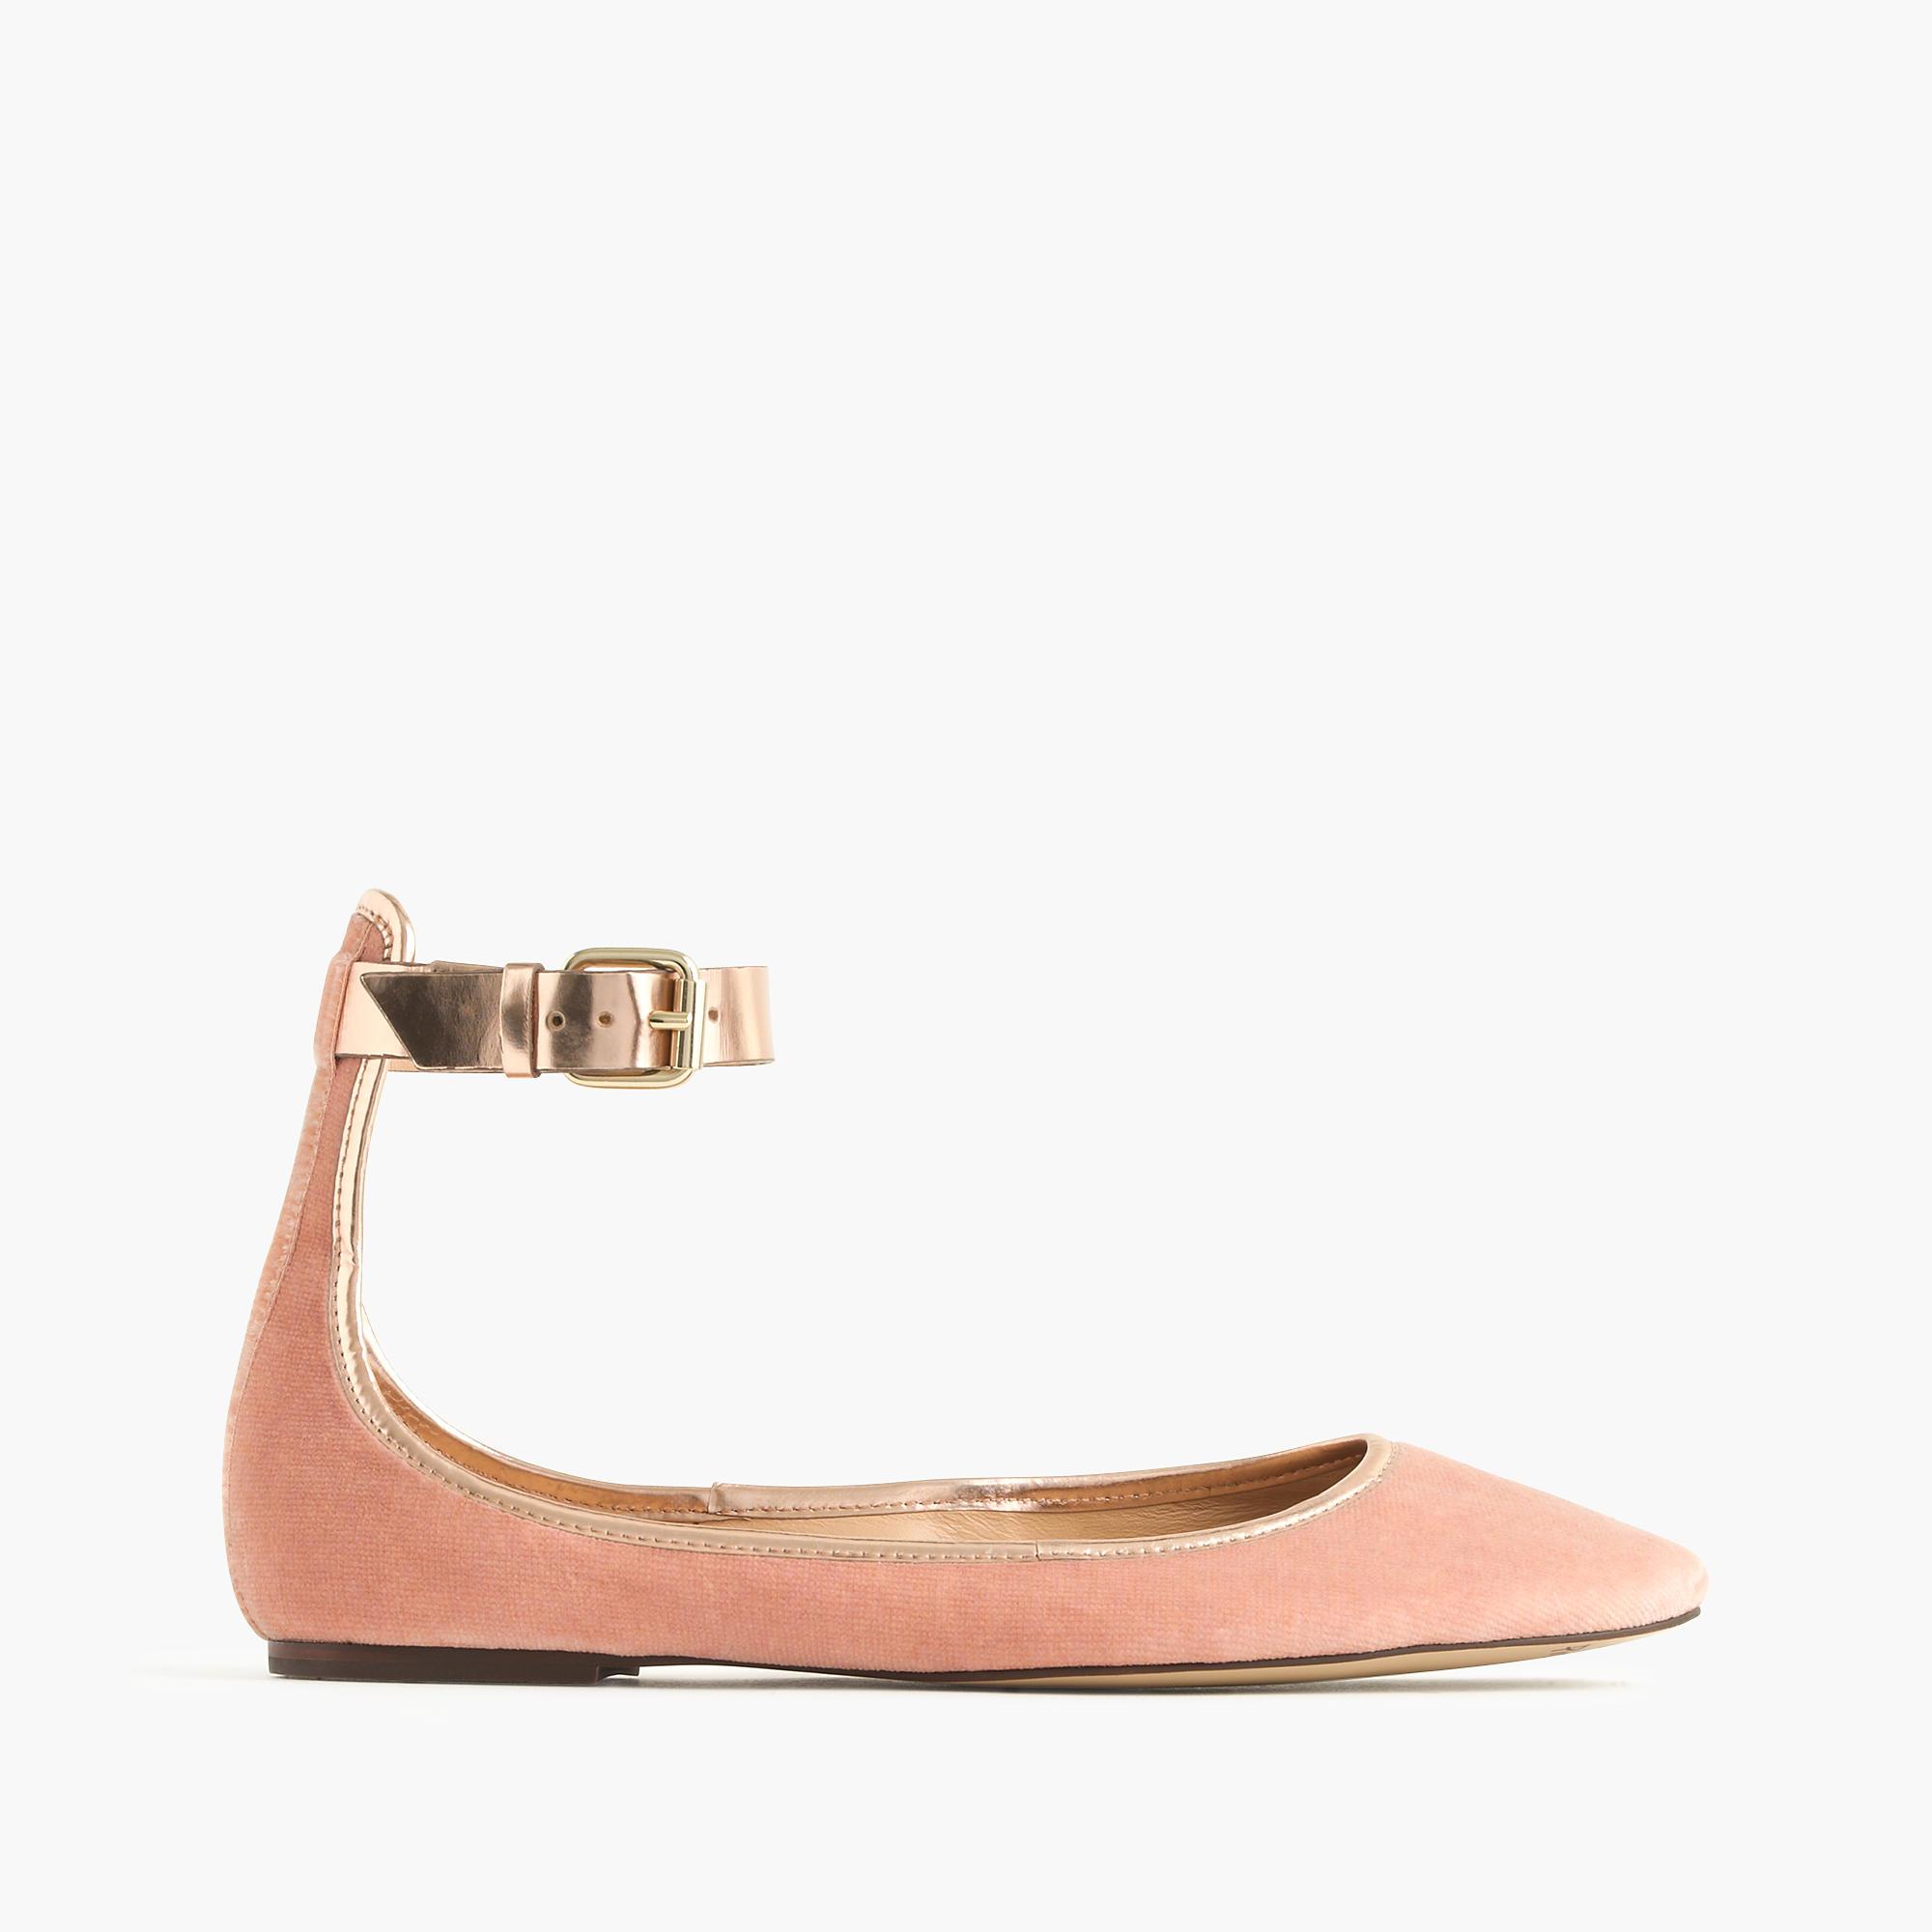 ebc6a223a J.Crew Velvet Ankle-strap Ballet Flats in Pink - Lyst